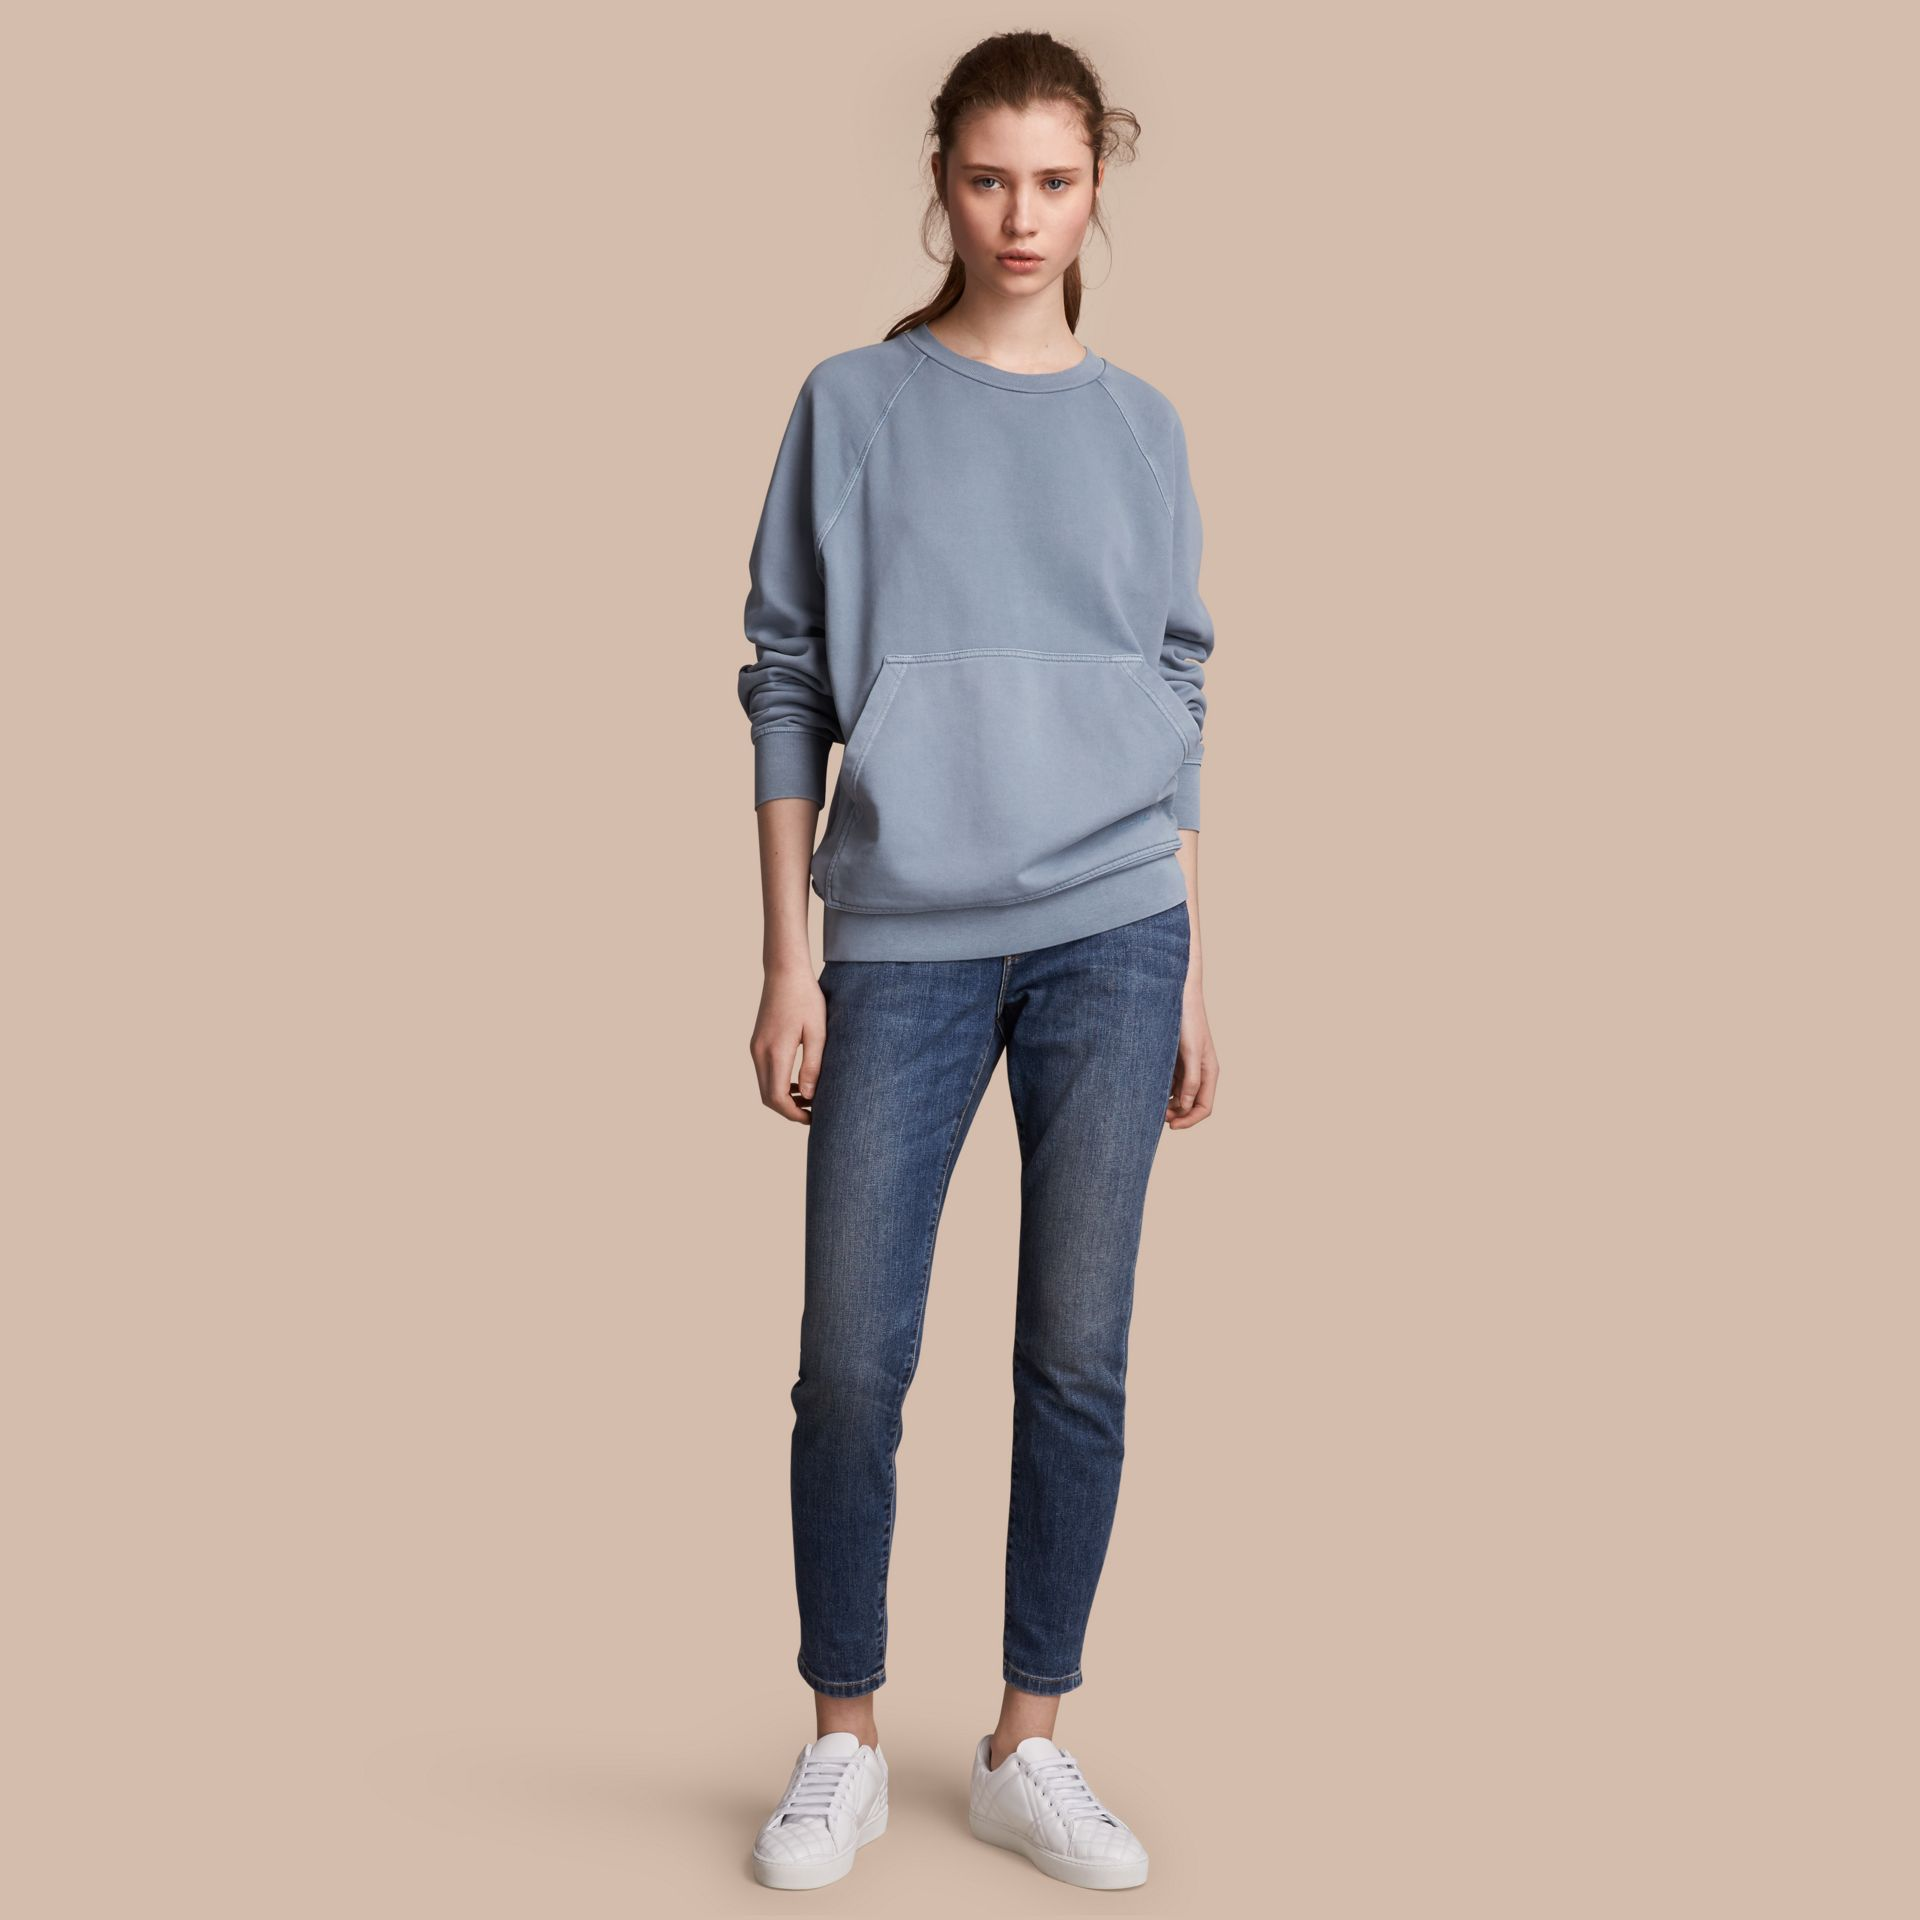 Unisex Pigment-dyed Cotton Oversize Sweatshirt in Dusty Blue - Women | Burberry Singapore - gallery image 1